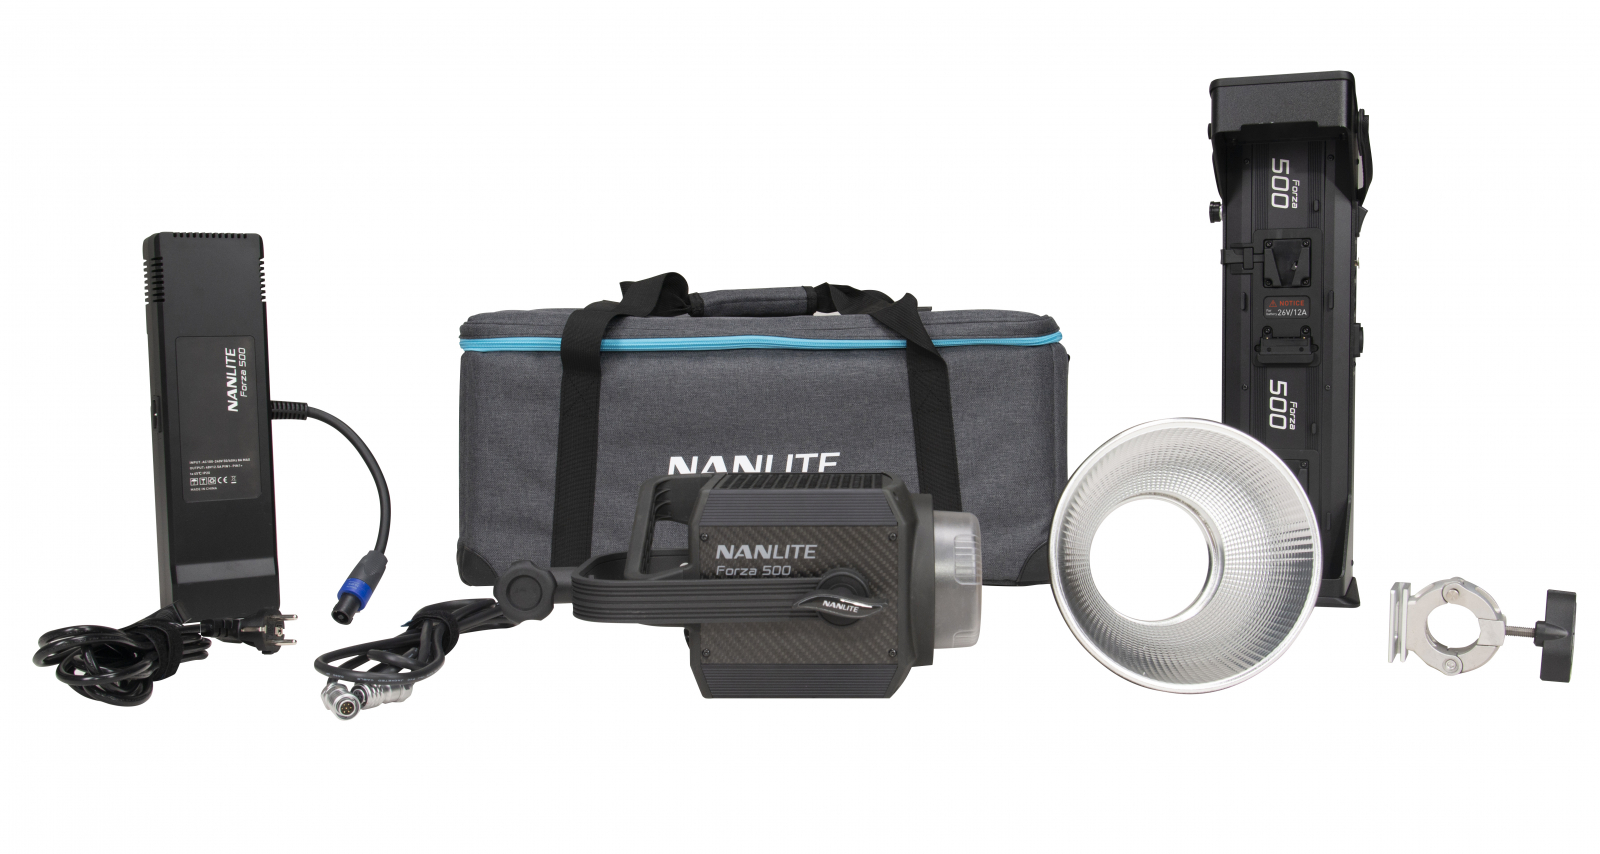 KAISER NANLITE Forza 500 LED-Leuchte